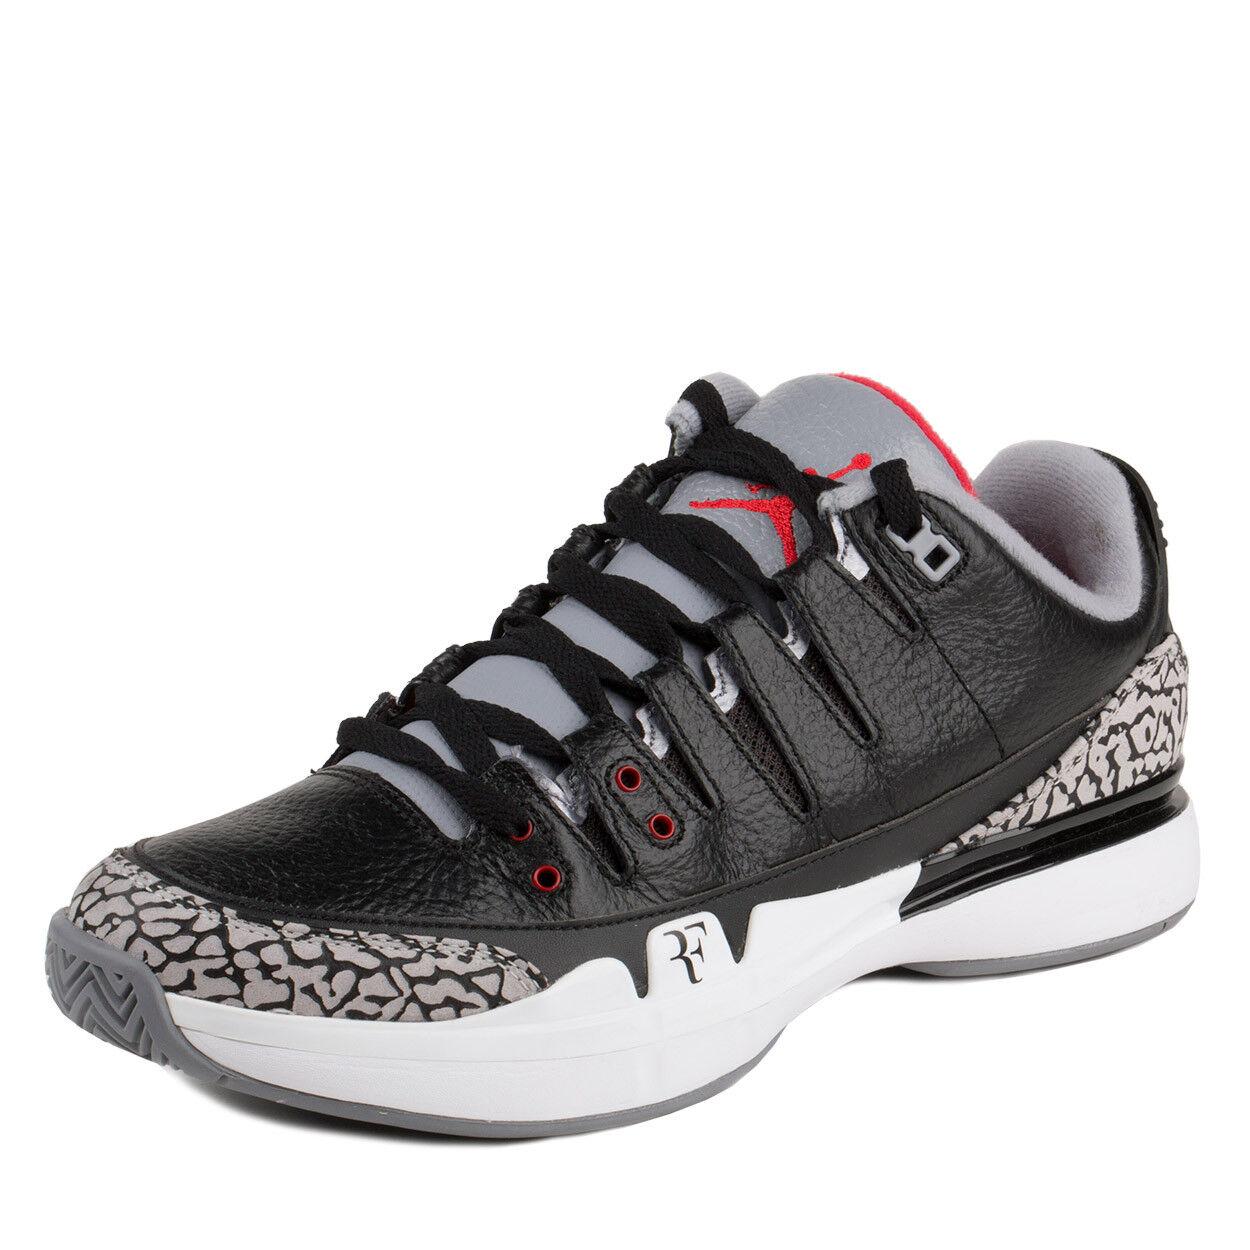 Nike Mens Zoom Vapor AJ3 Black White-Cement Grey 709998-010 Sz 6